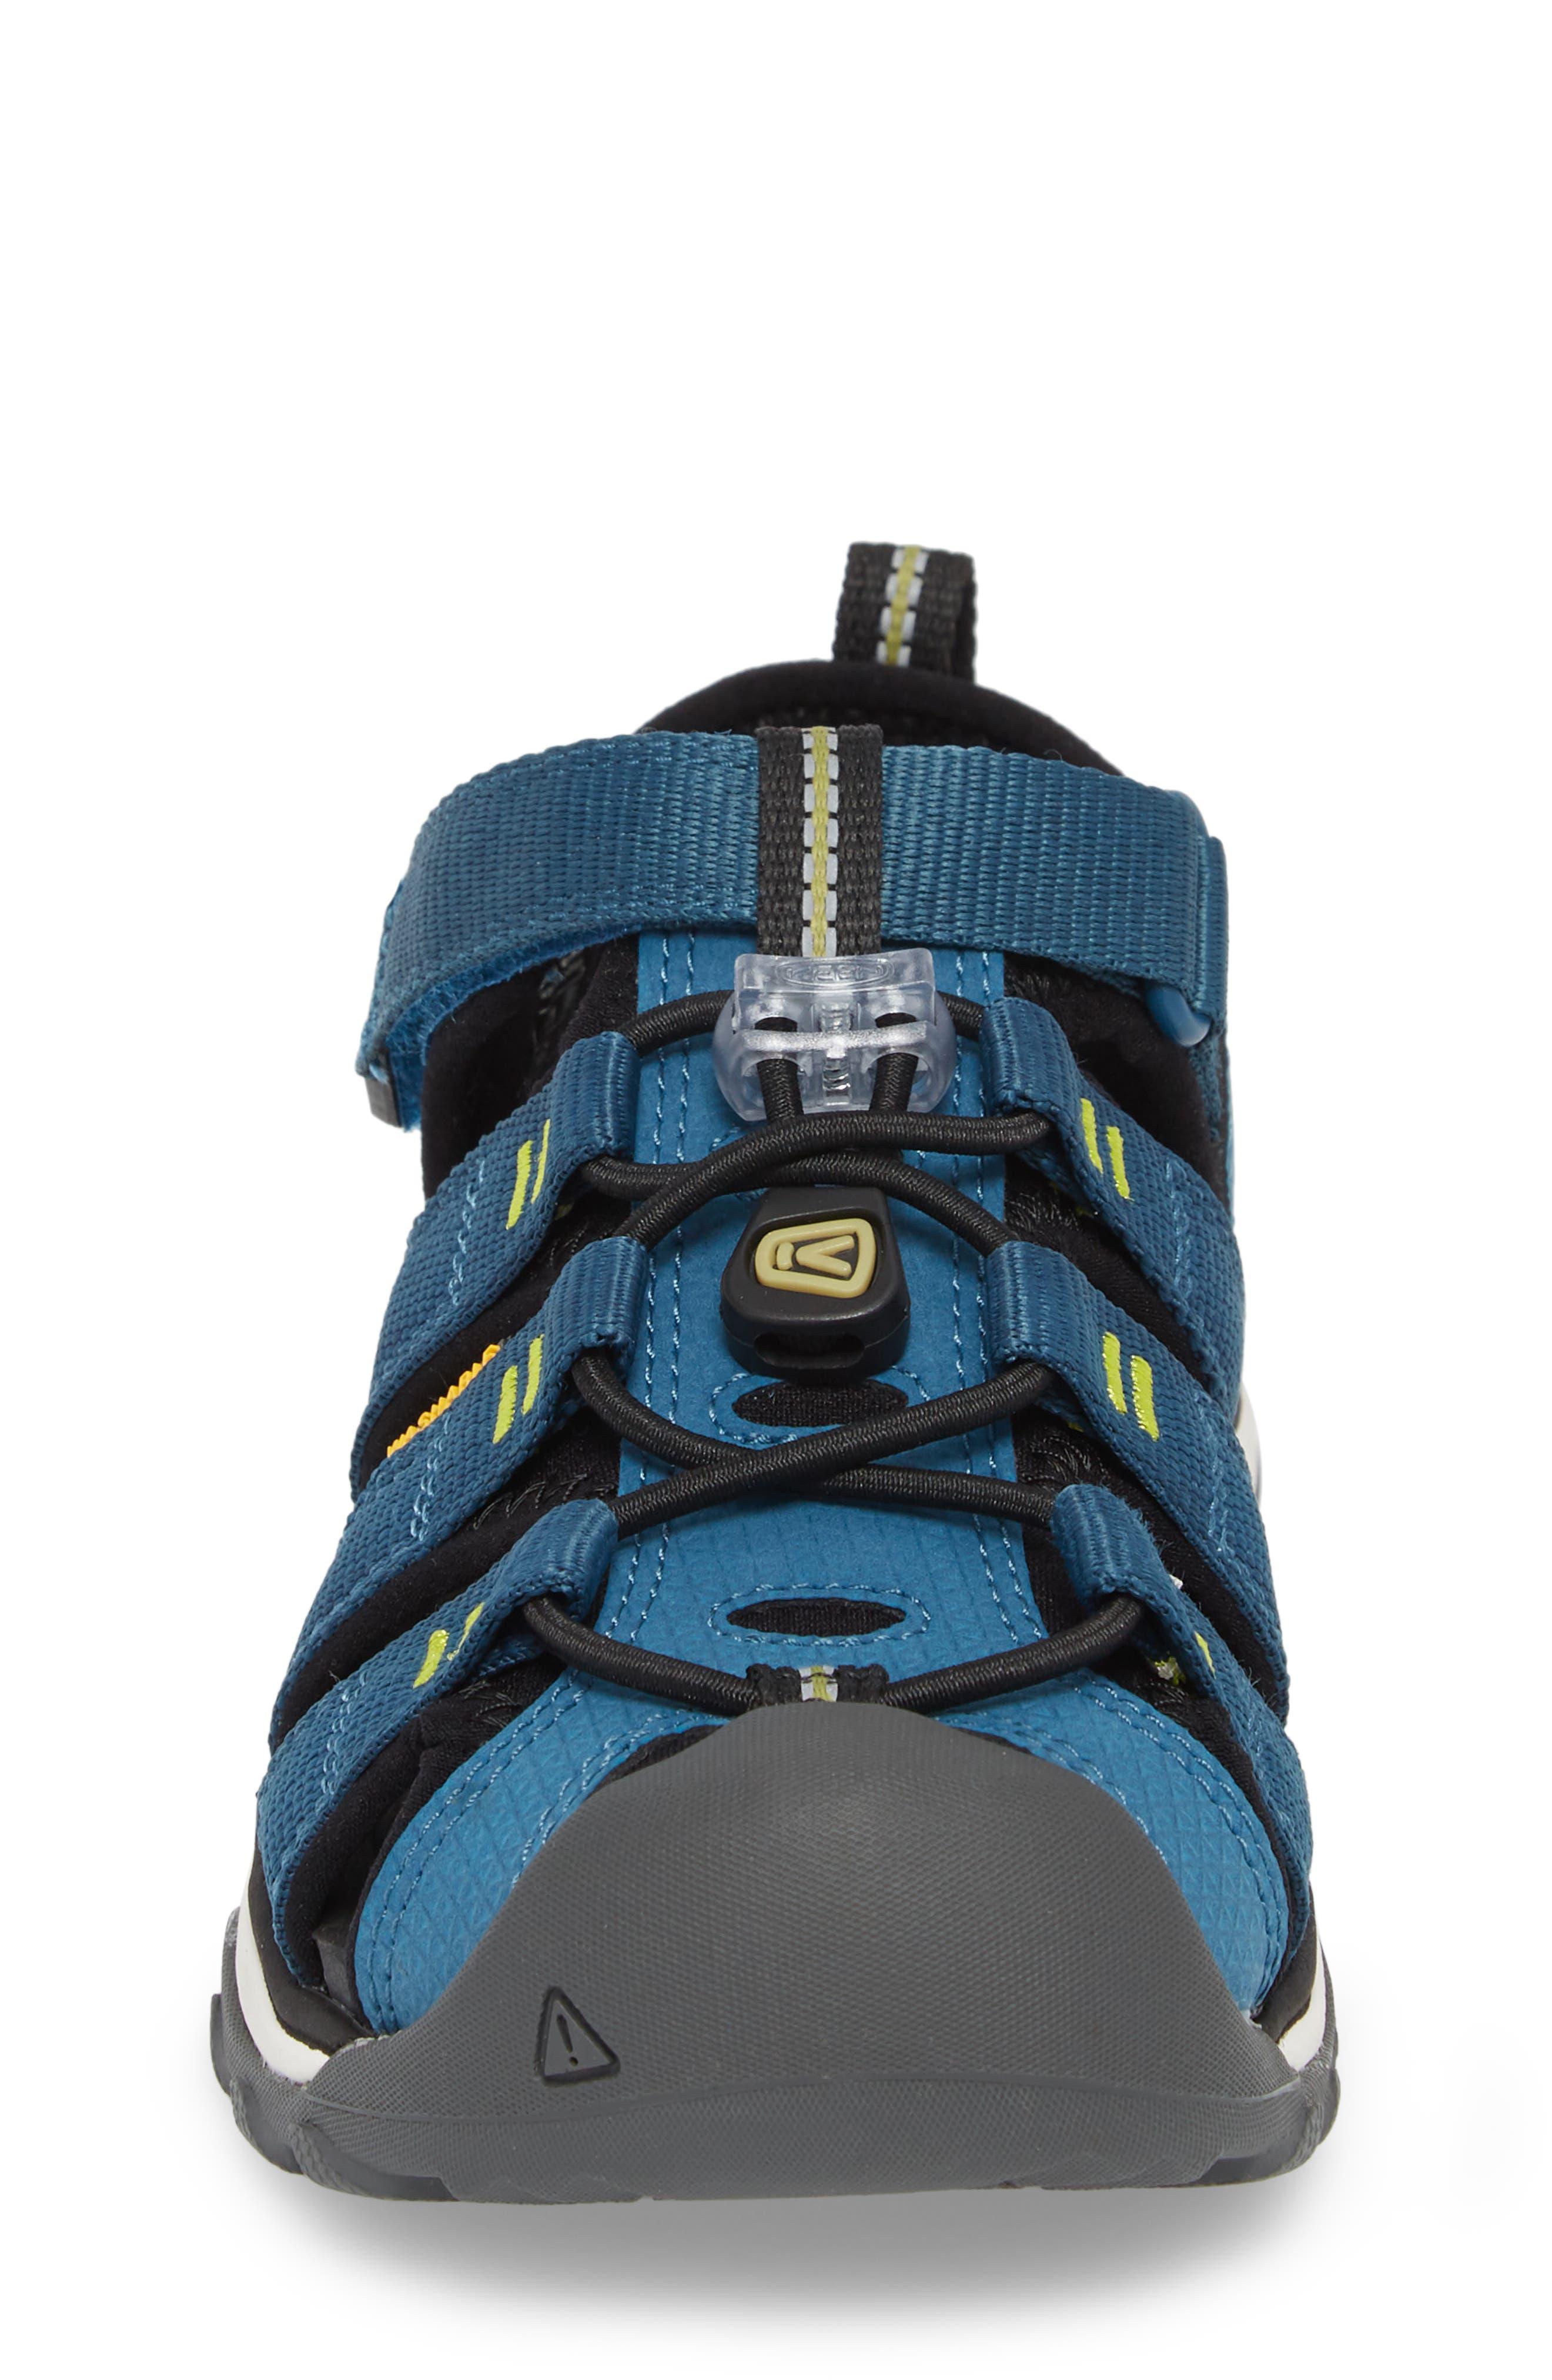 Newport Neo H2 Water Friendly Sandal,                             Alternate thumbnail 4, color,                             LEGION BLUE/ MOSS